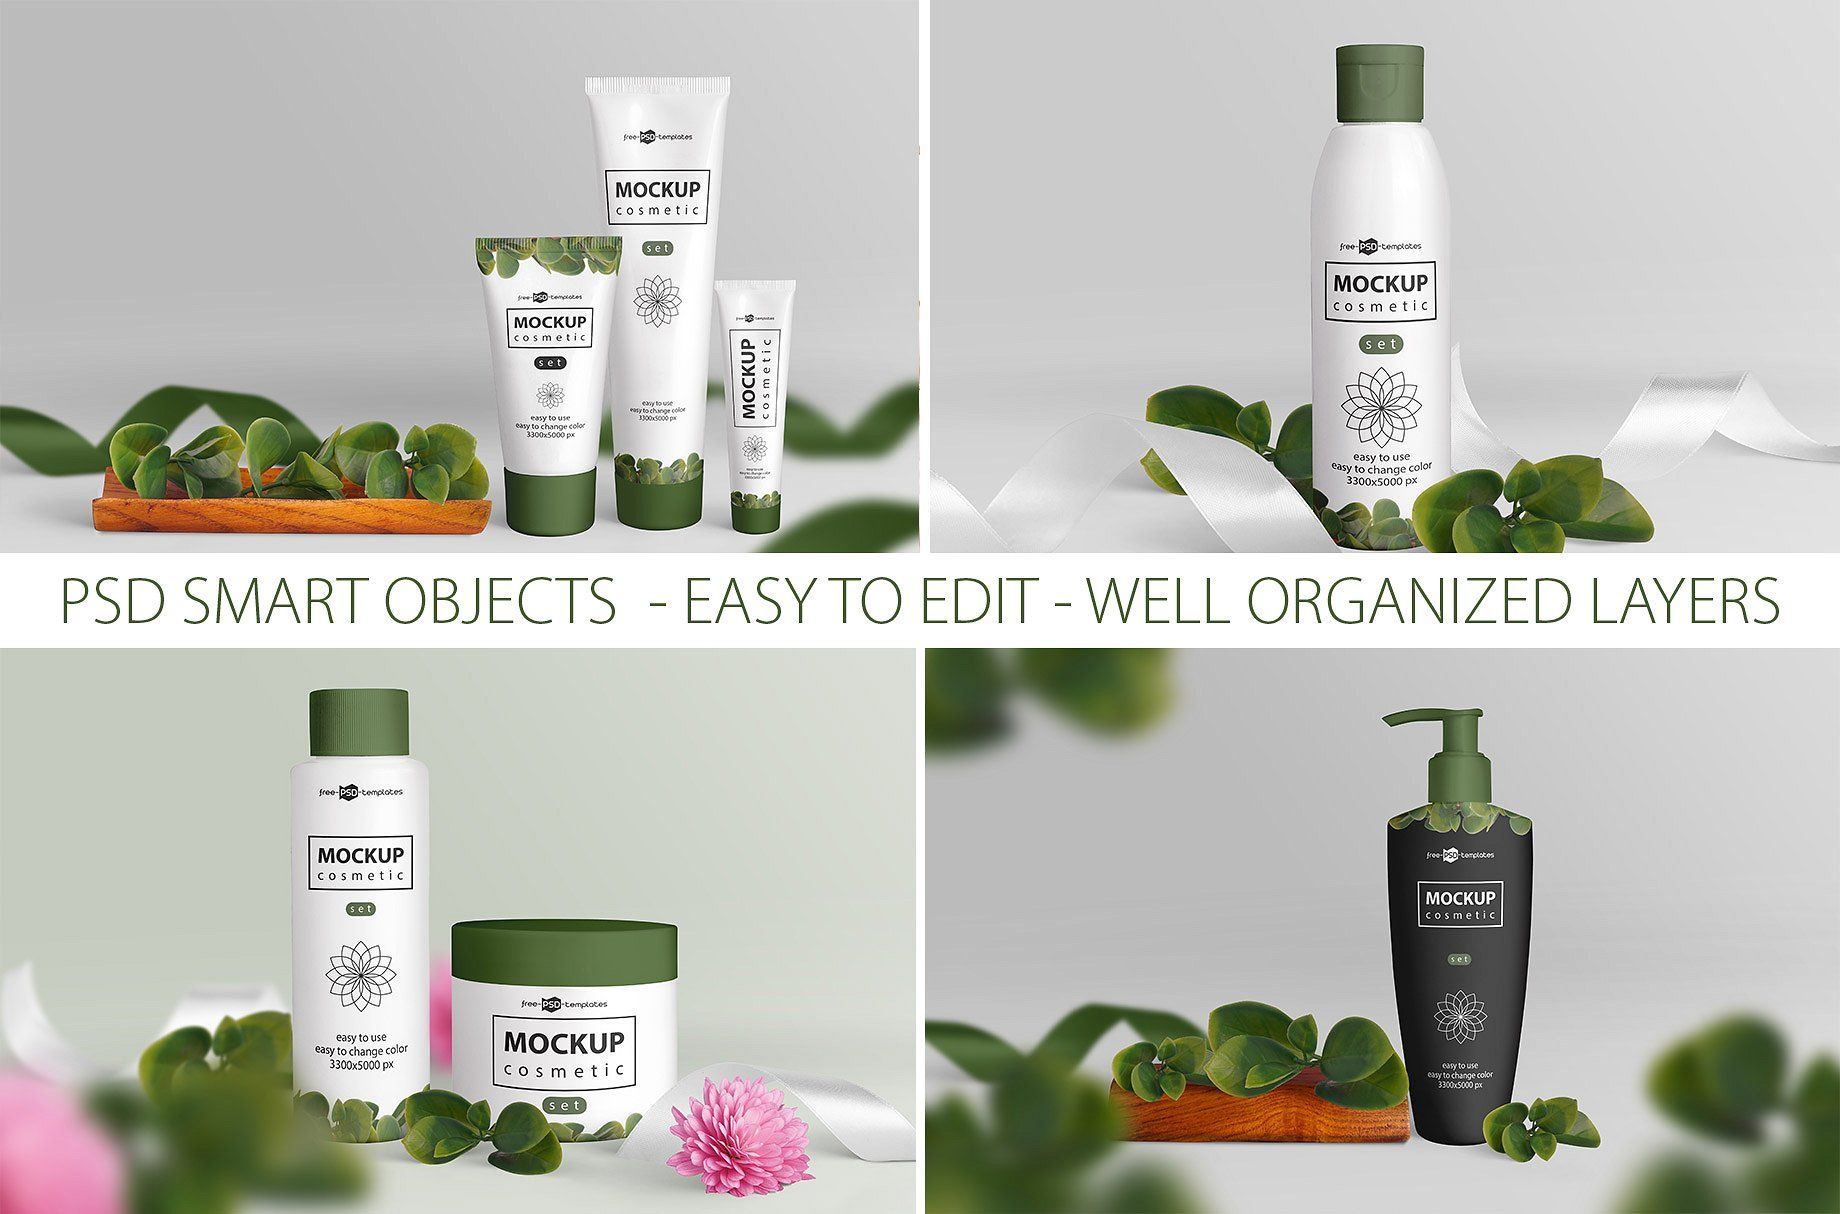 Cosmetic Mockup Set Cosmetics Mockup Free Cosmetics Cosmetics